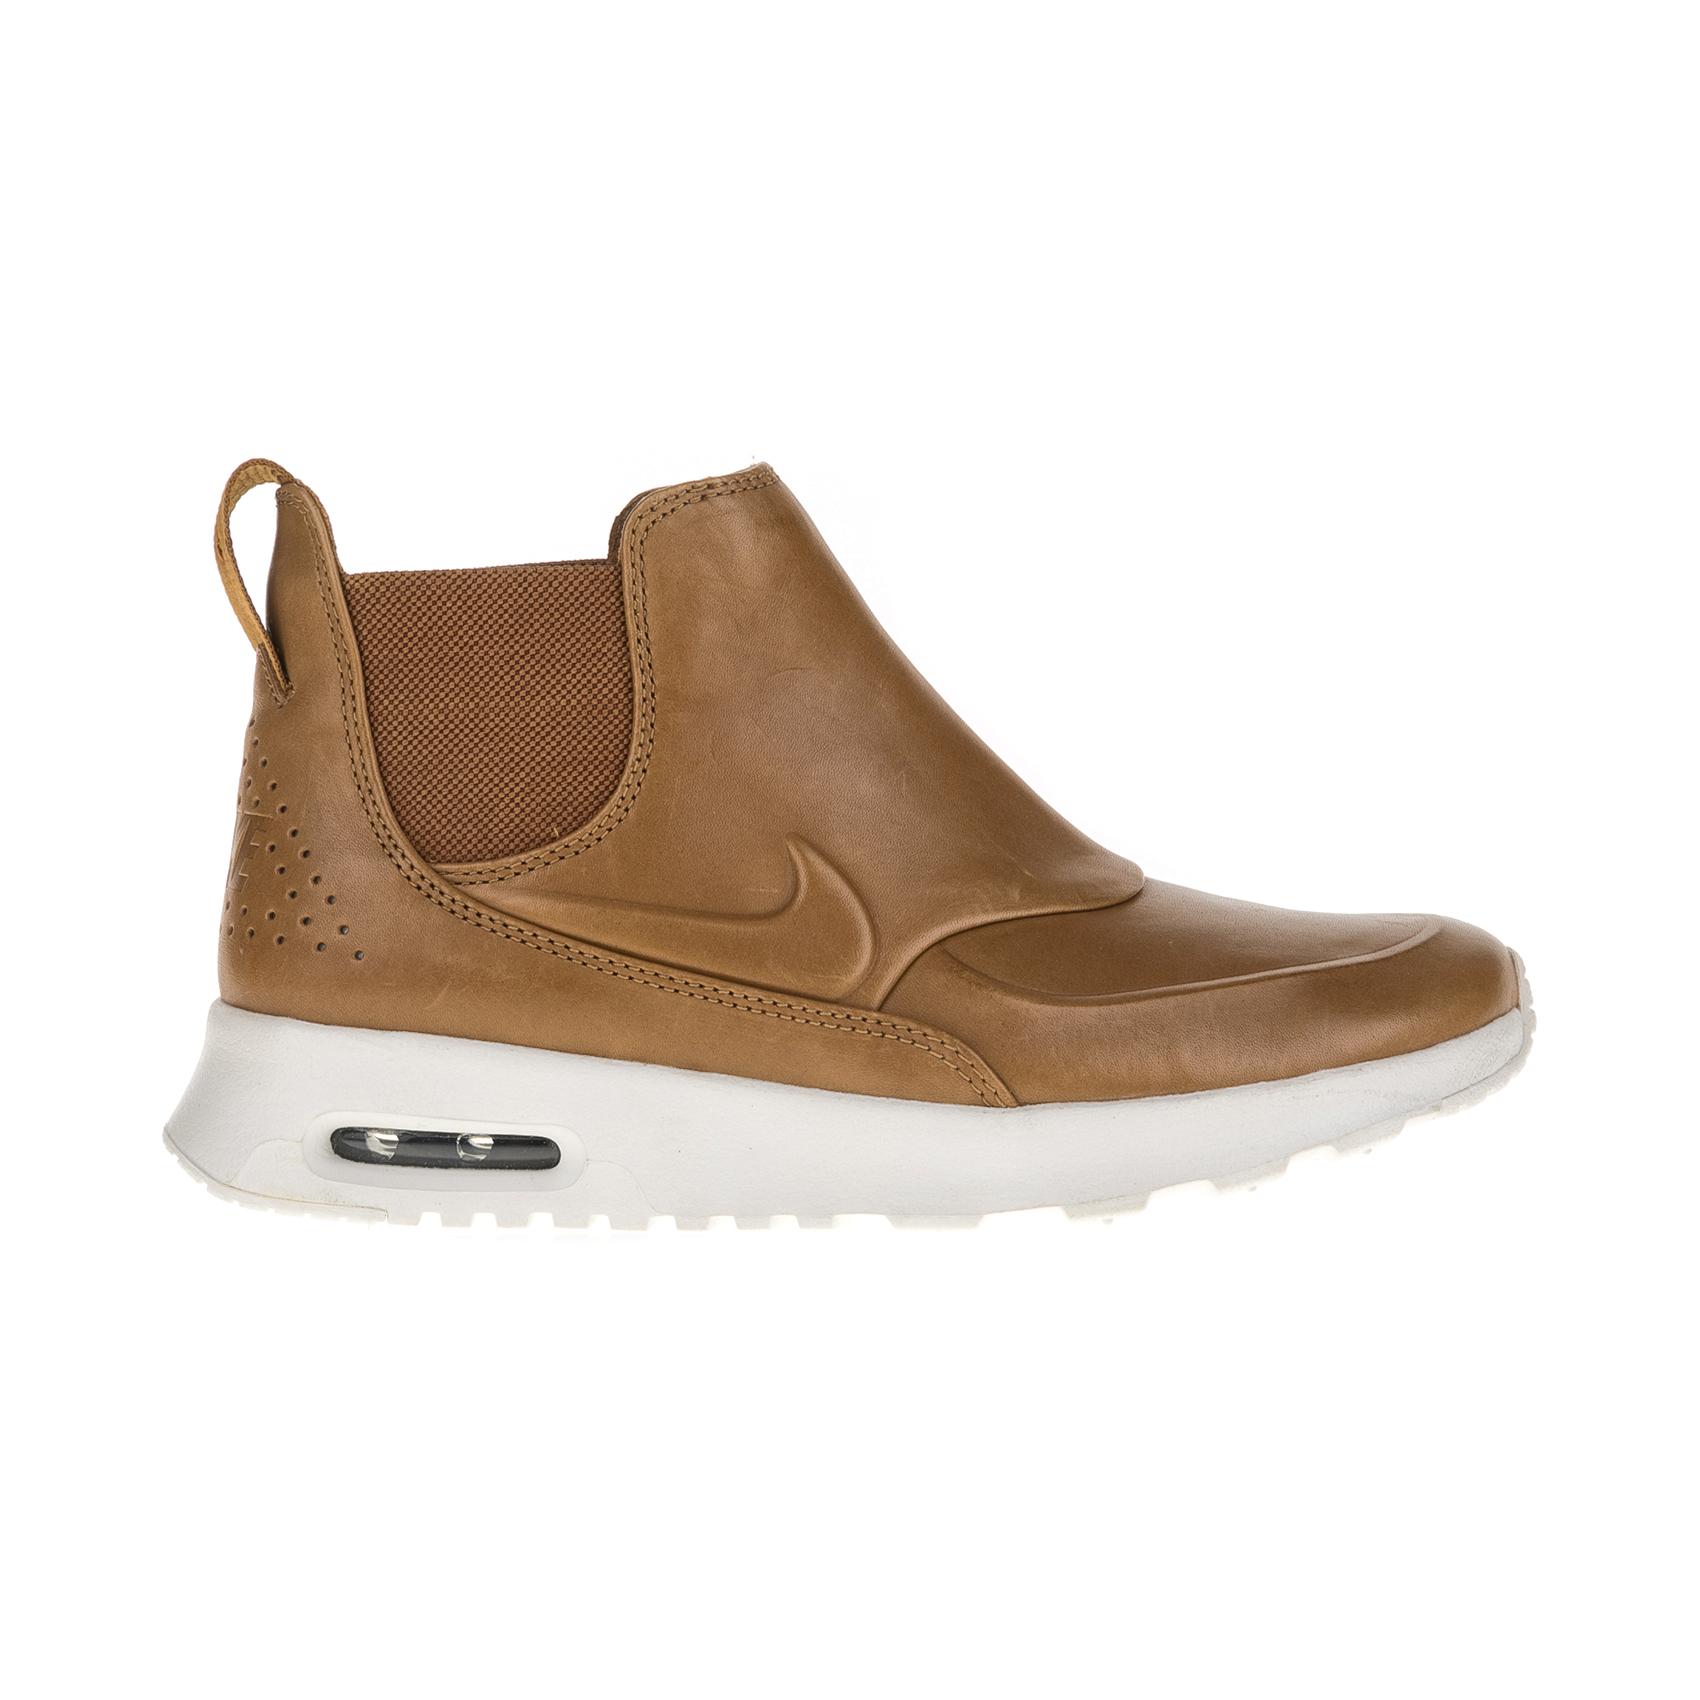 NIKE – Γυναικεία παπούτσια Nike AIR MAX THEA MID καφέ